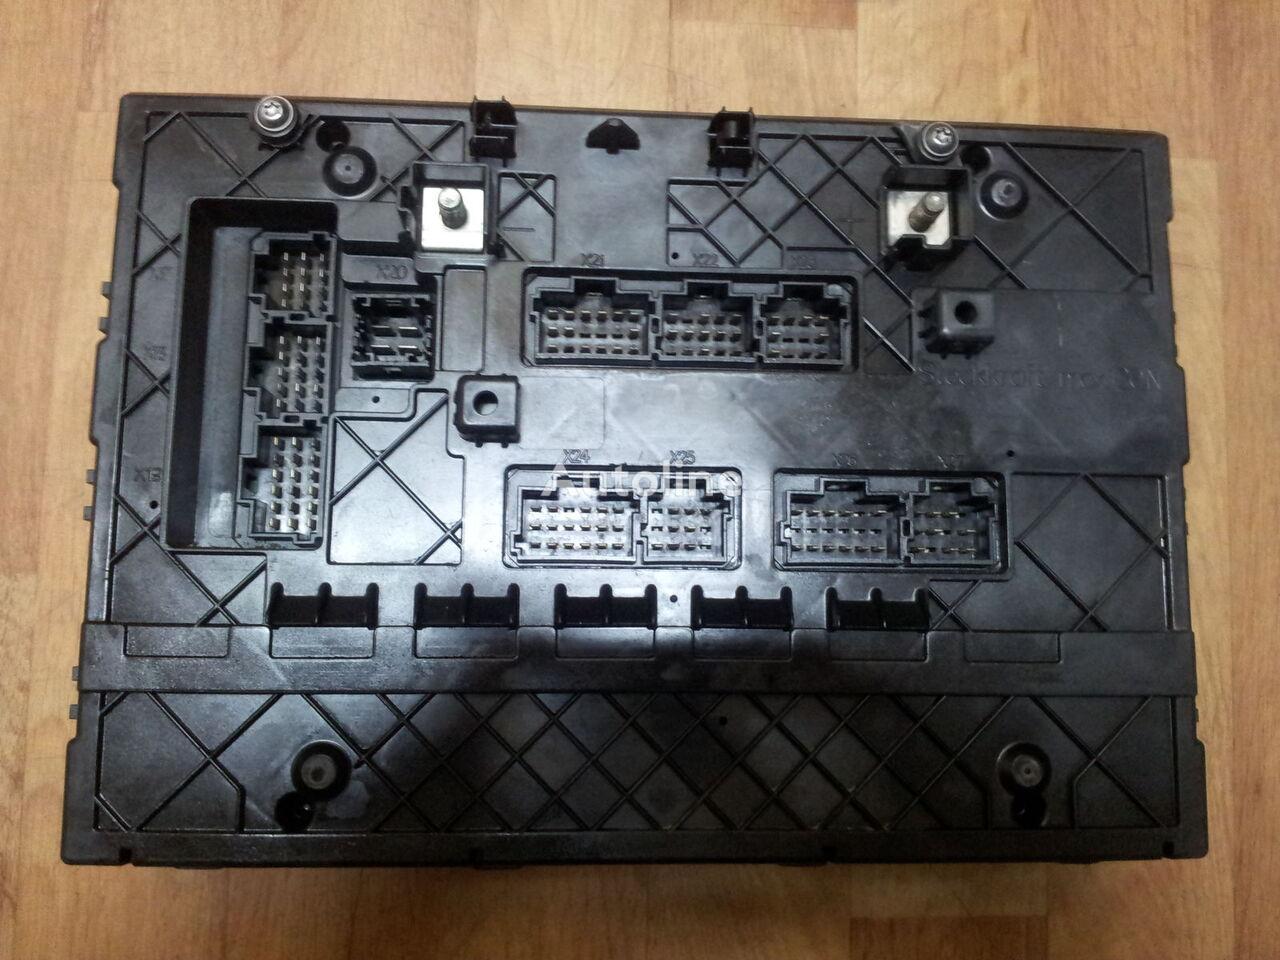 وحدة التحكم MERCEDES-BENZ actros MP4, EURO6 Grundmodul, fuse box, relay box  ...